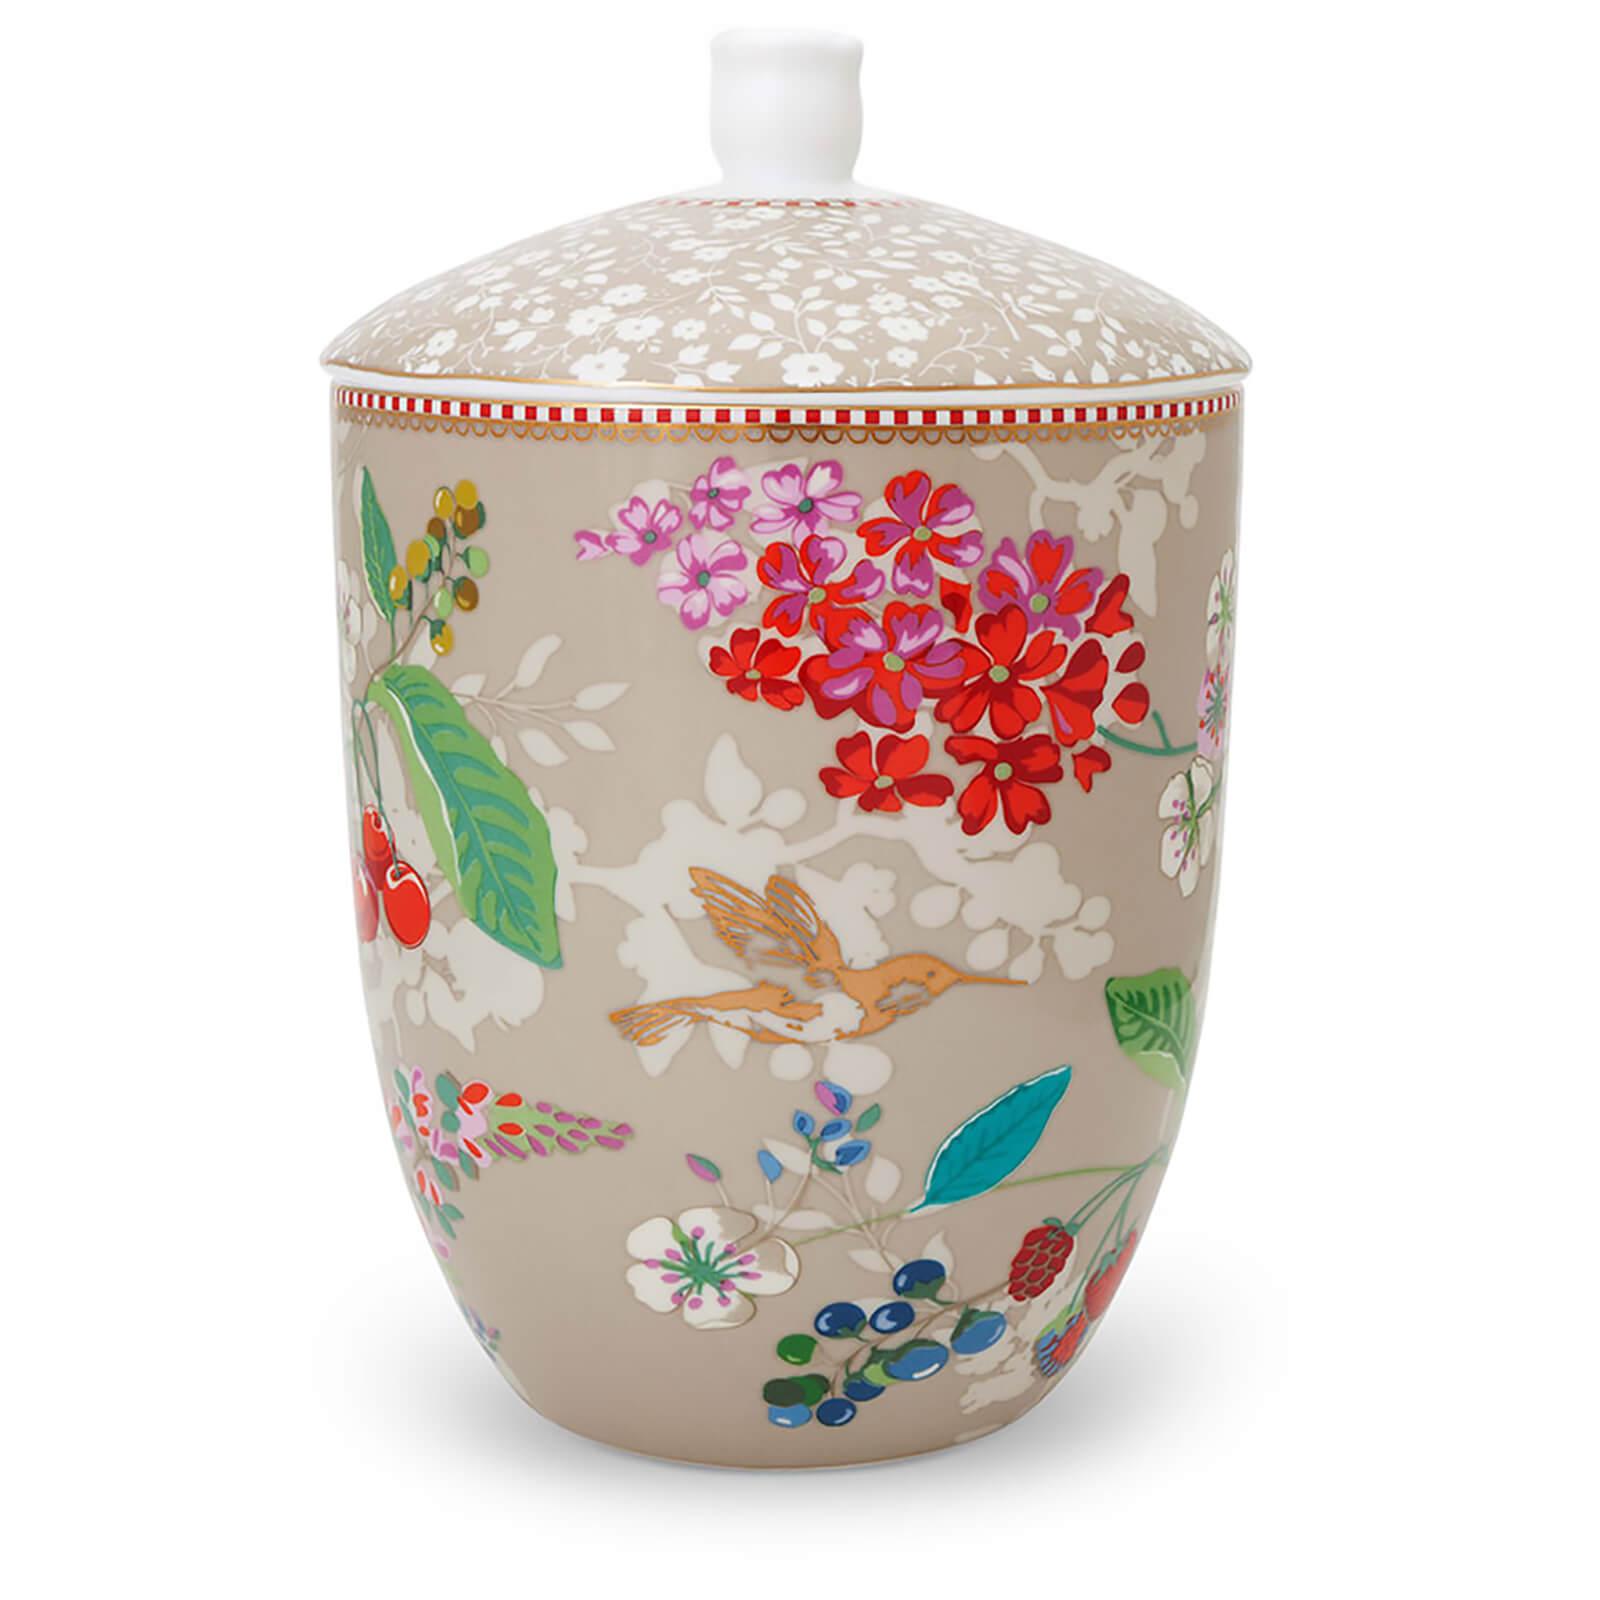 Pip Studio Hummingbird Storage Jar - Khaki